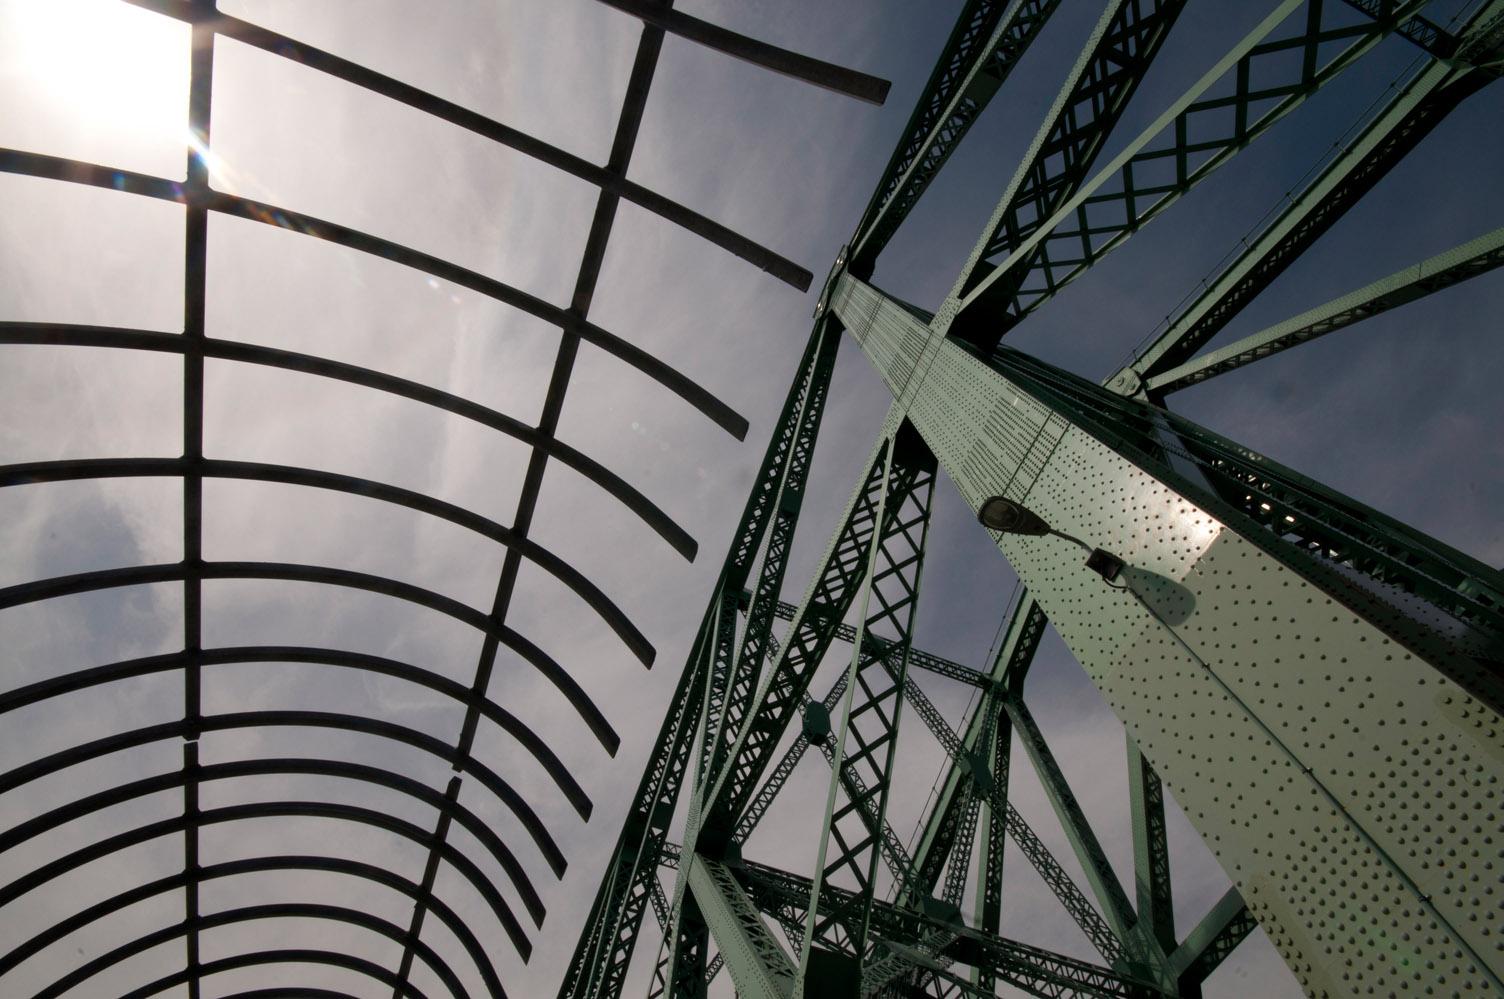 Mass of metal, Pont Jacques Cartier, Montreal